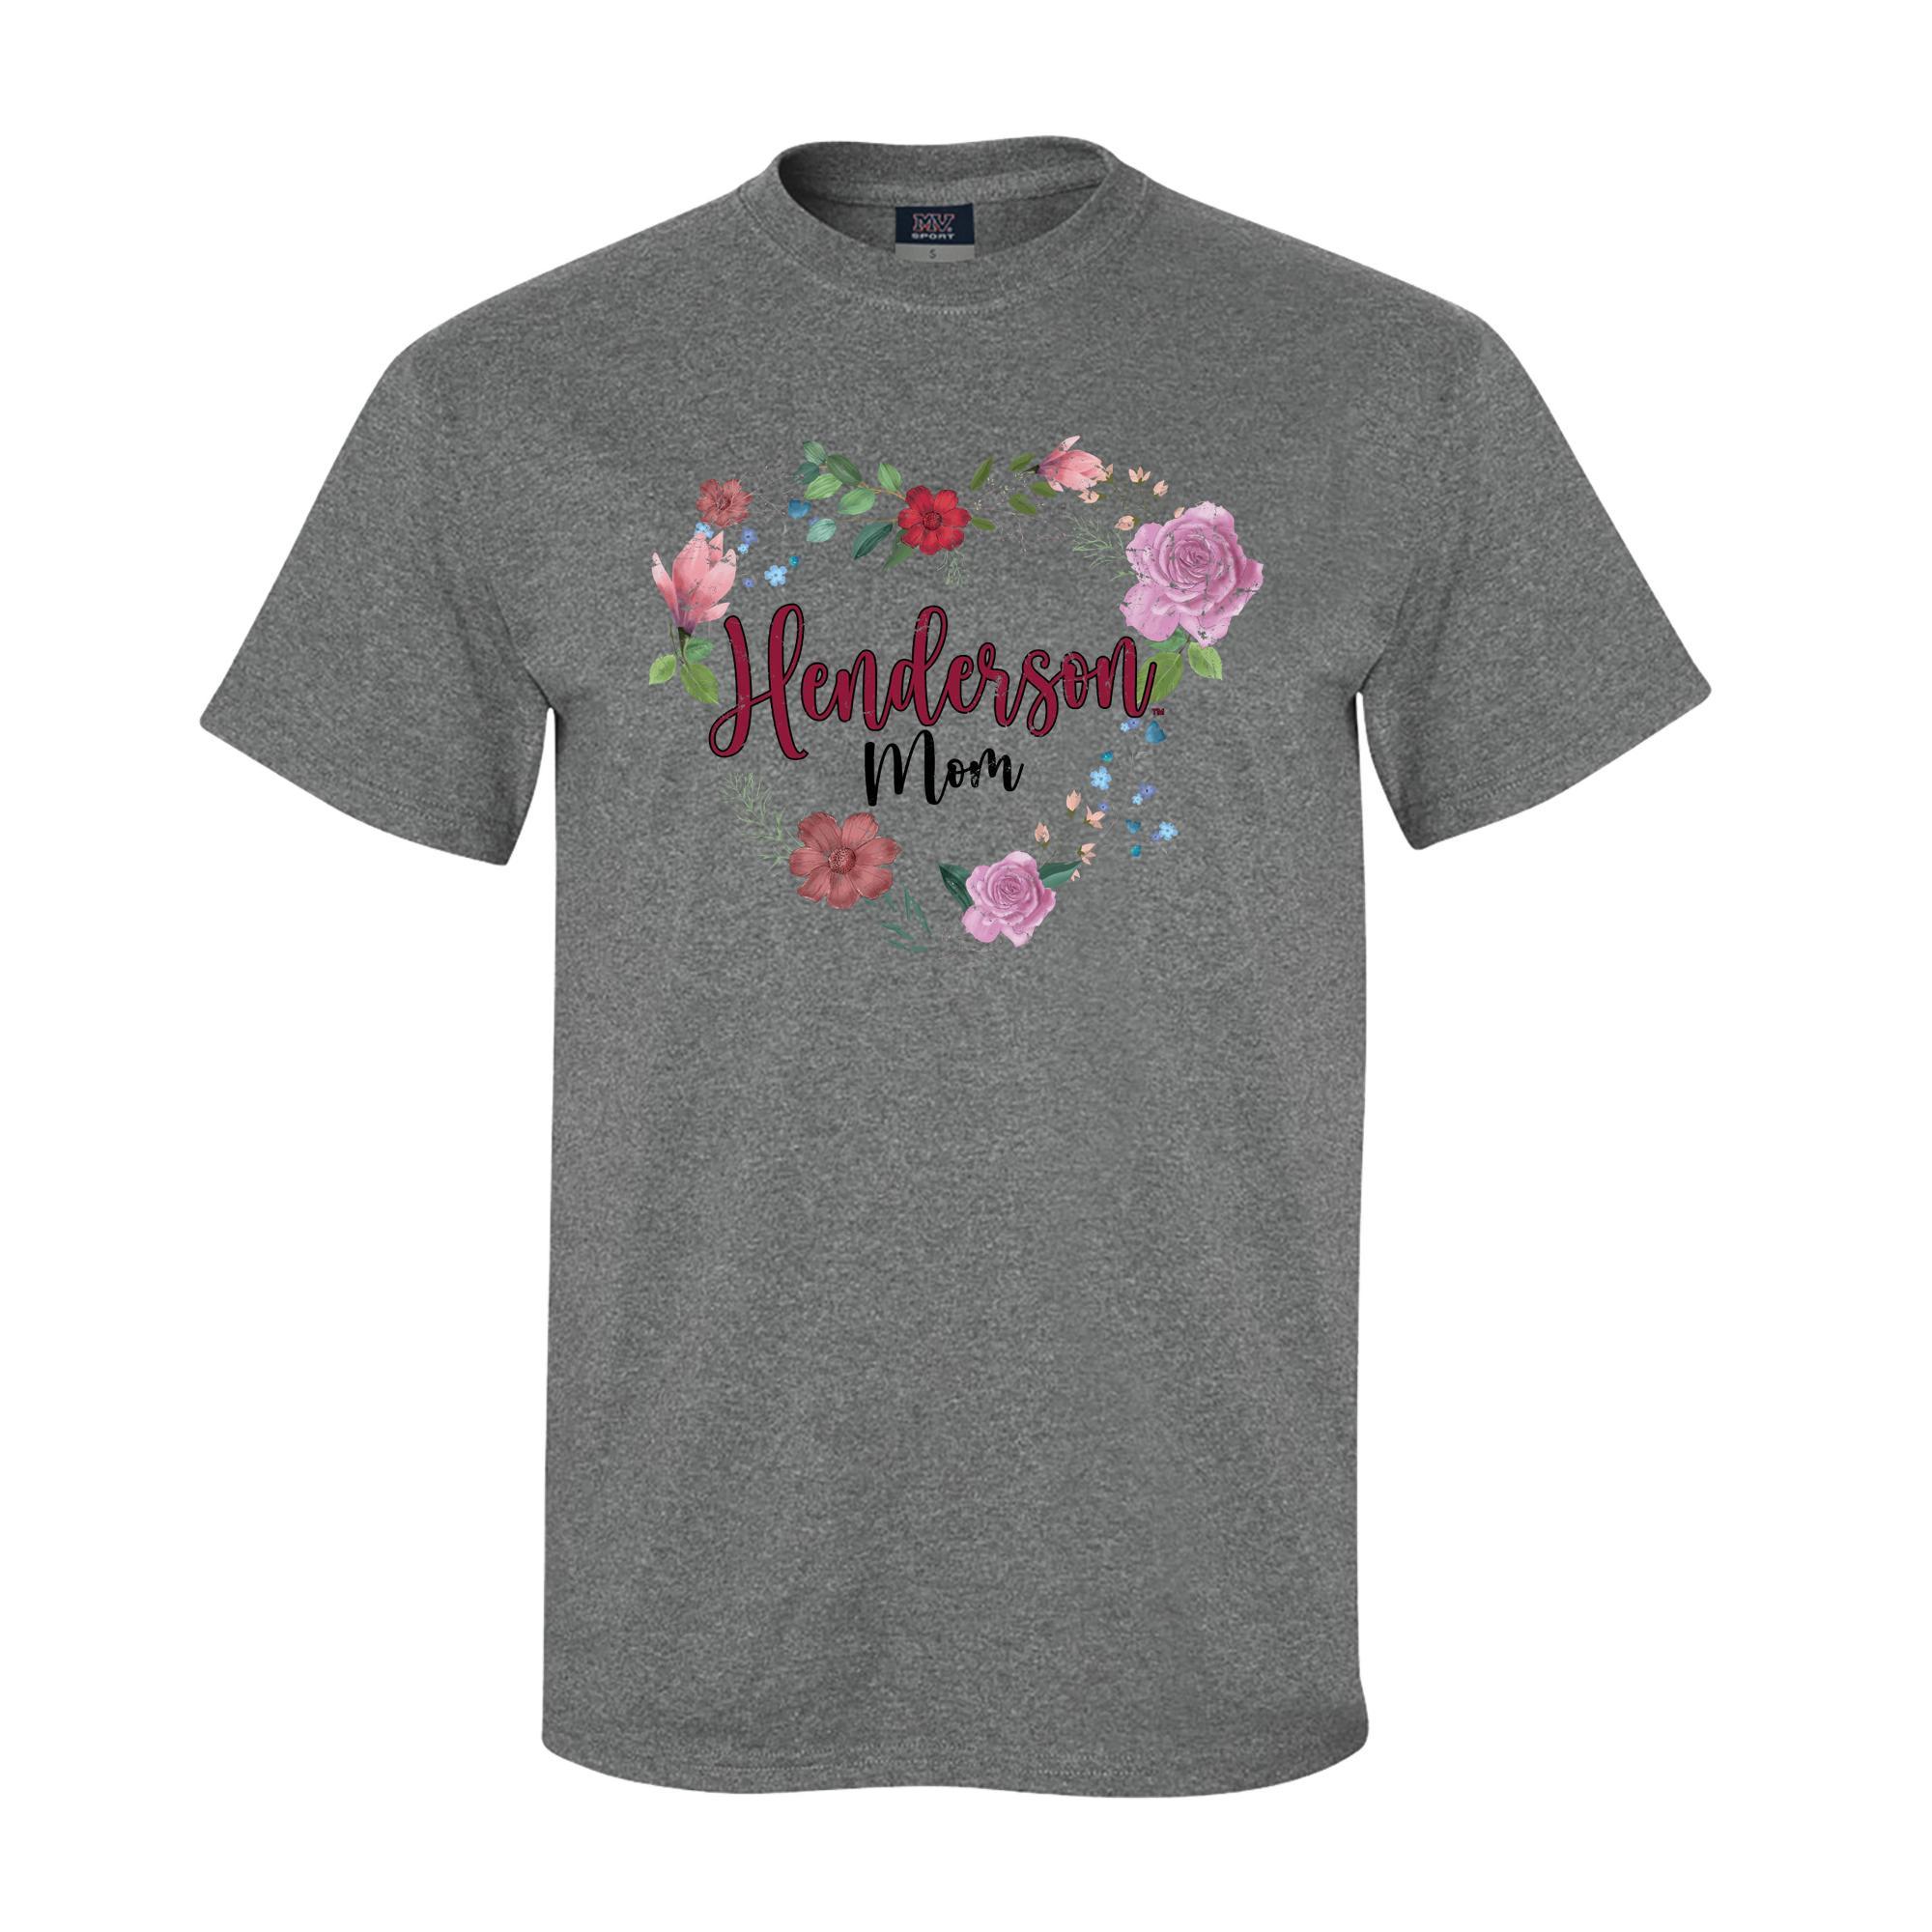 image of: Henderson Mom Classic Short Sleeve T-Shirt